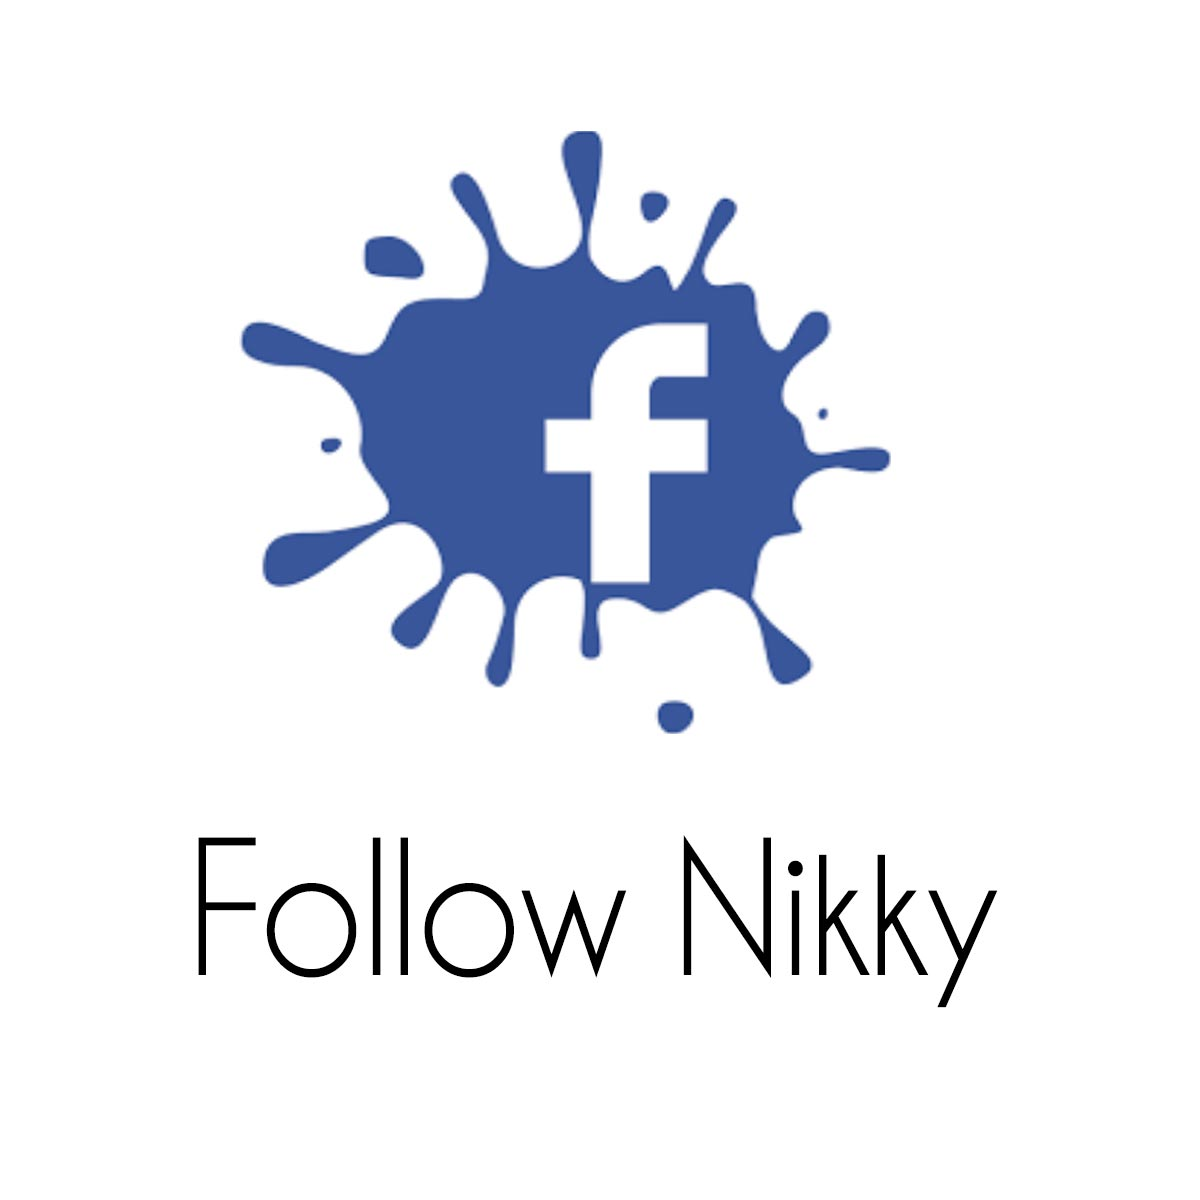 followfb.jpg